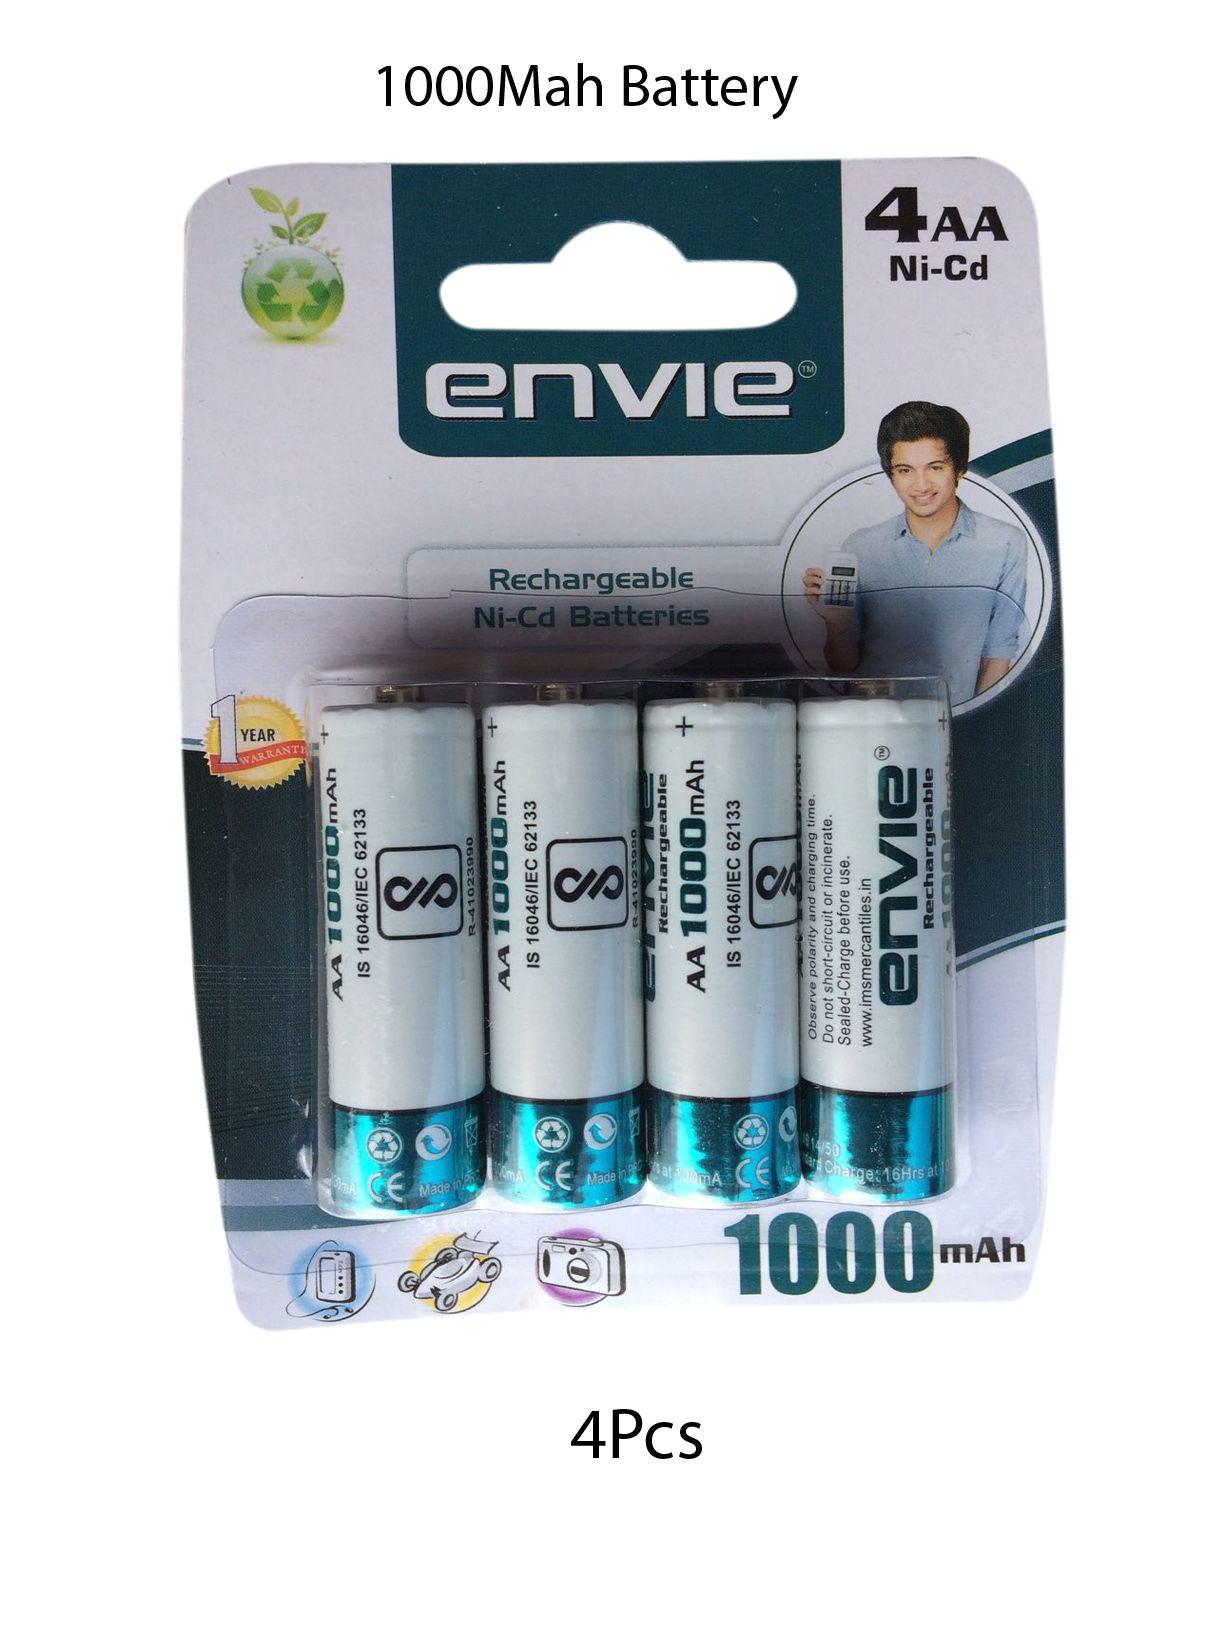 envie 1000 mah rechargeable battery 4